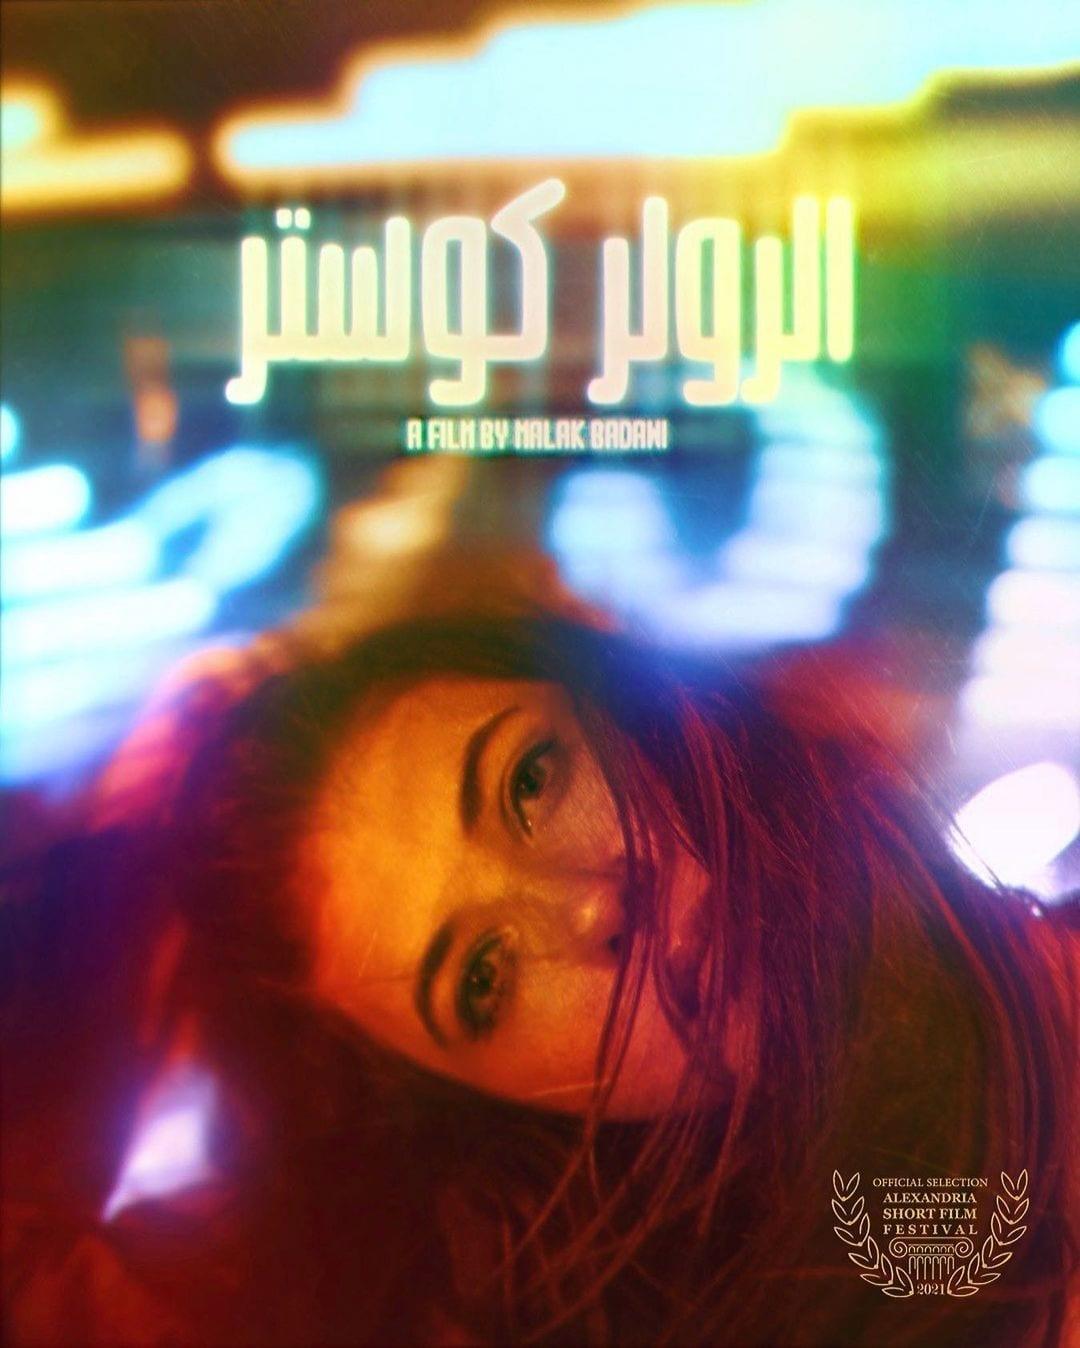 The Rollercoaster, a film by Malak Badawi